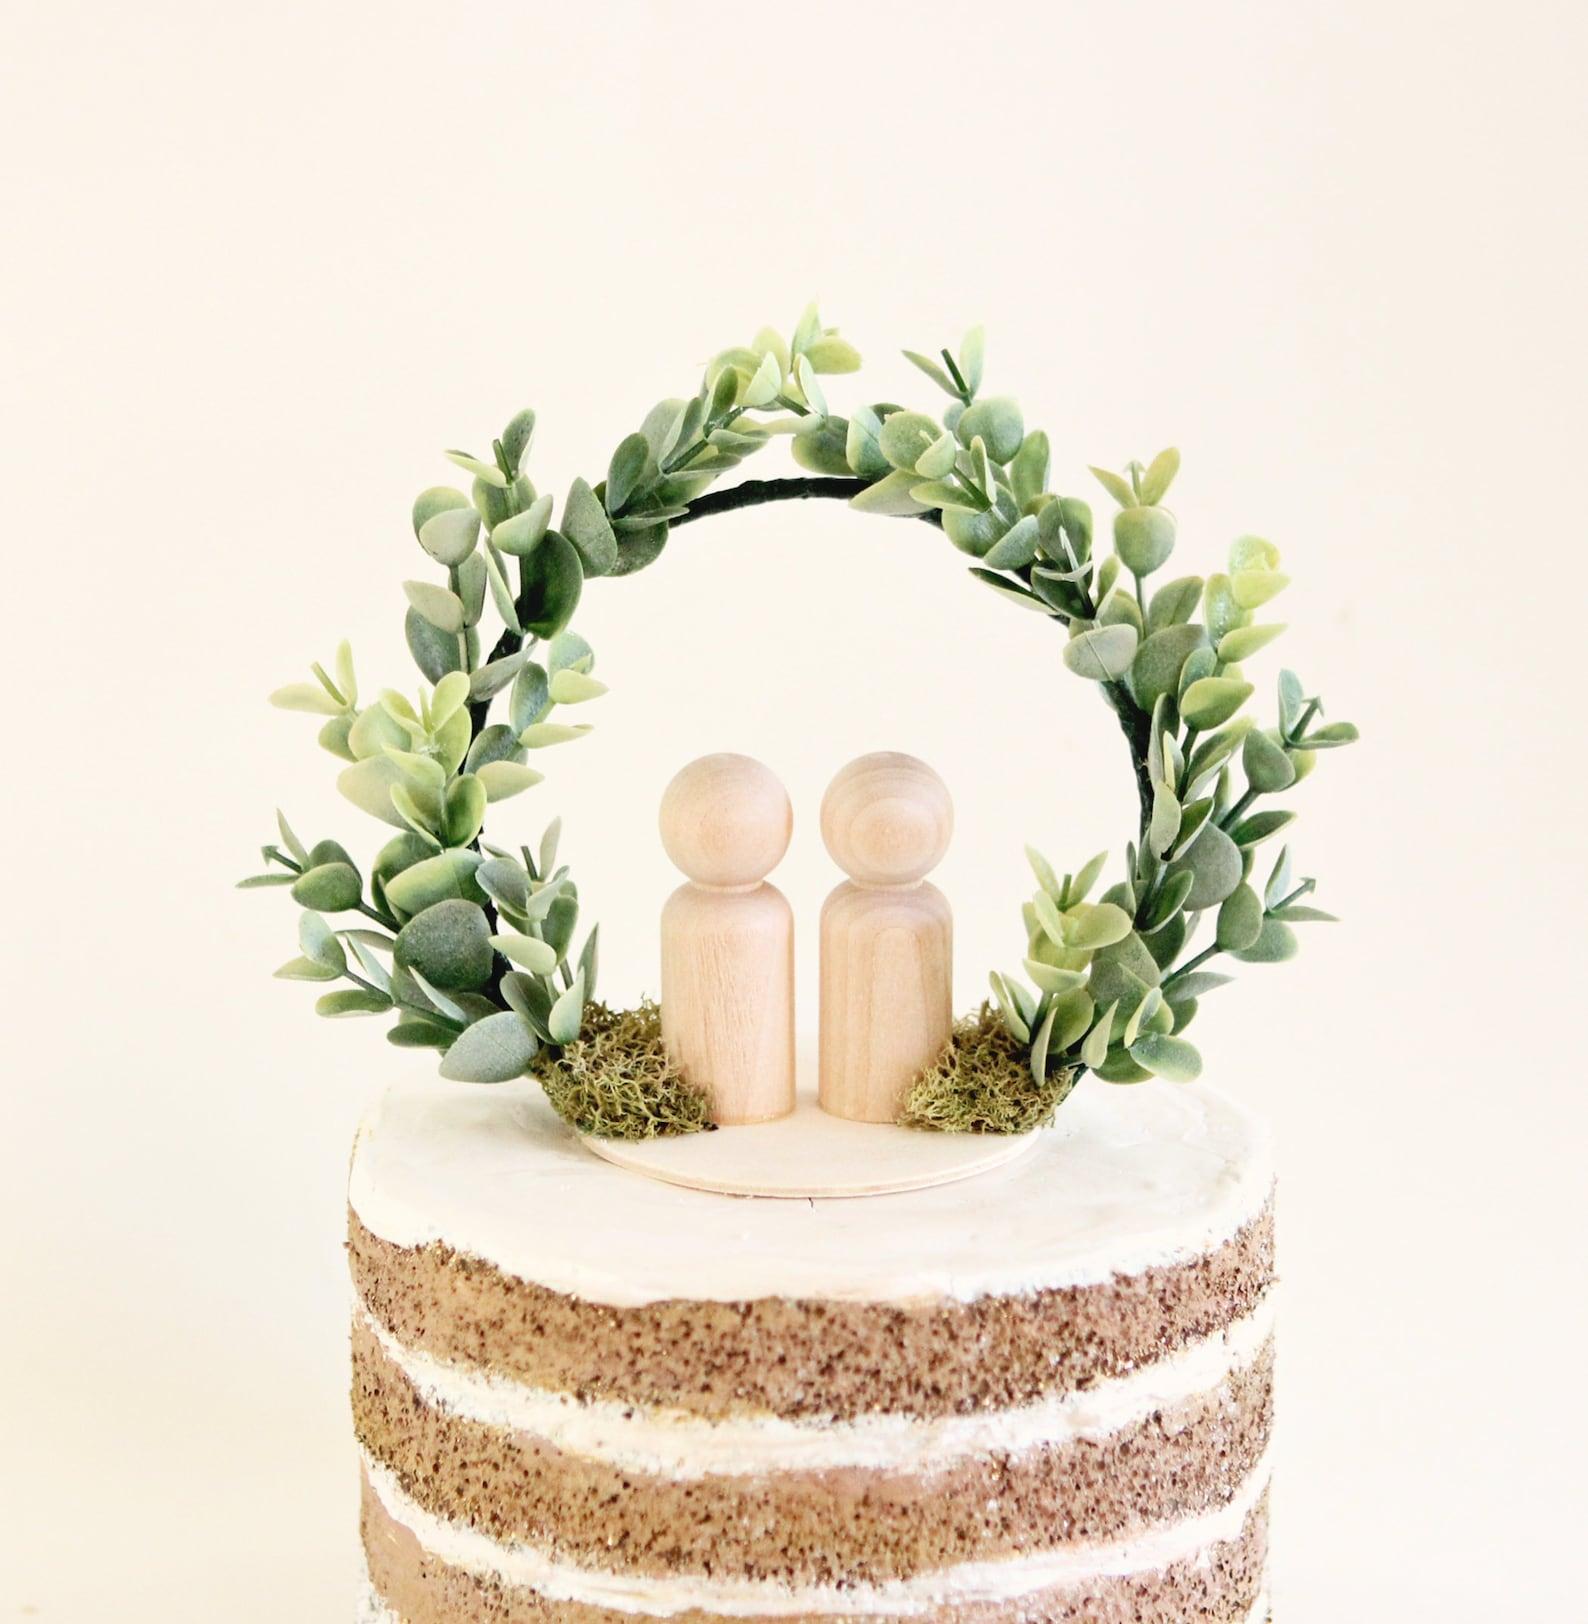 Cake Topper originell